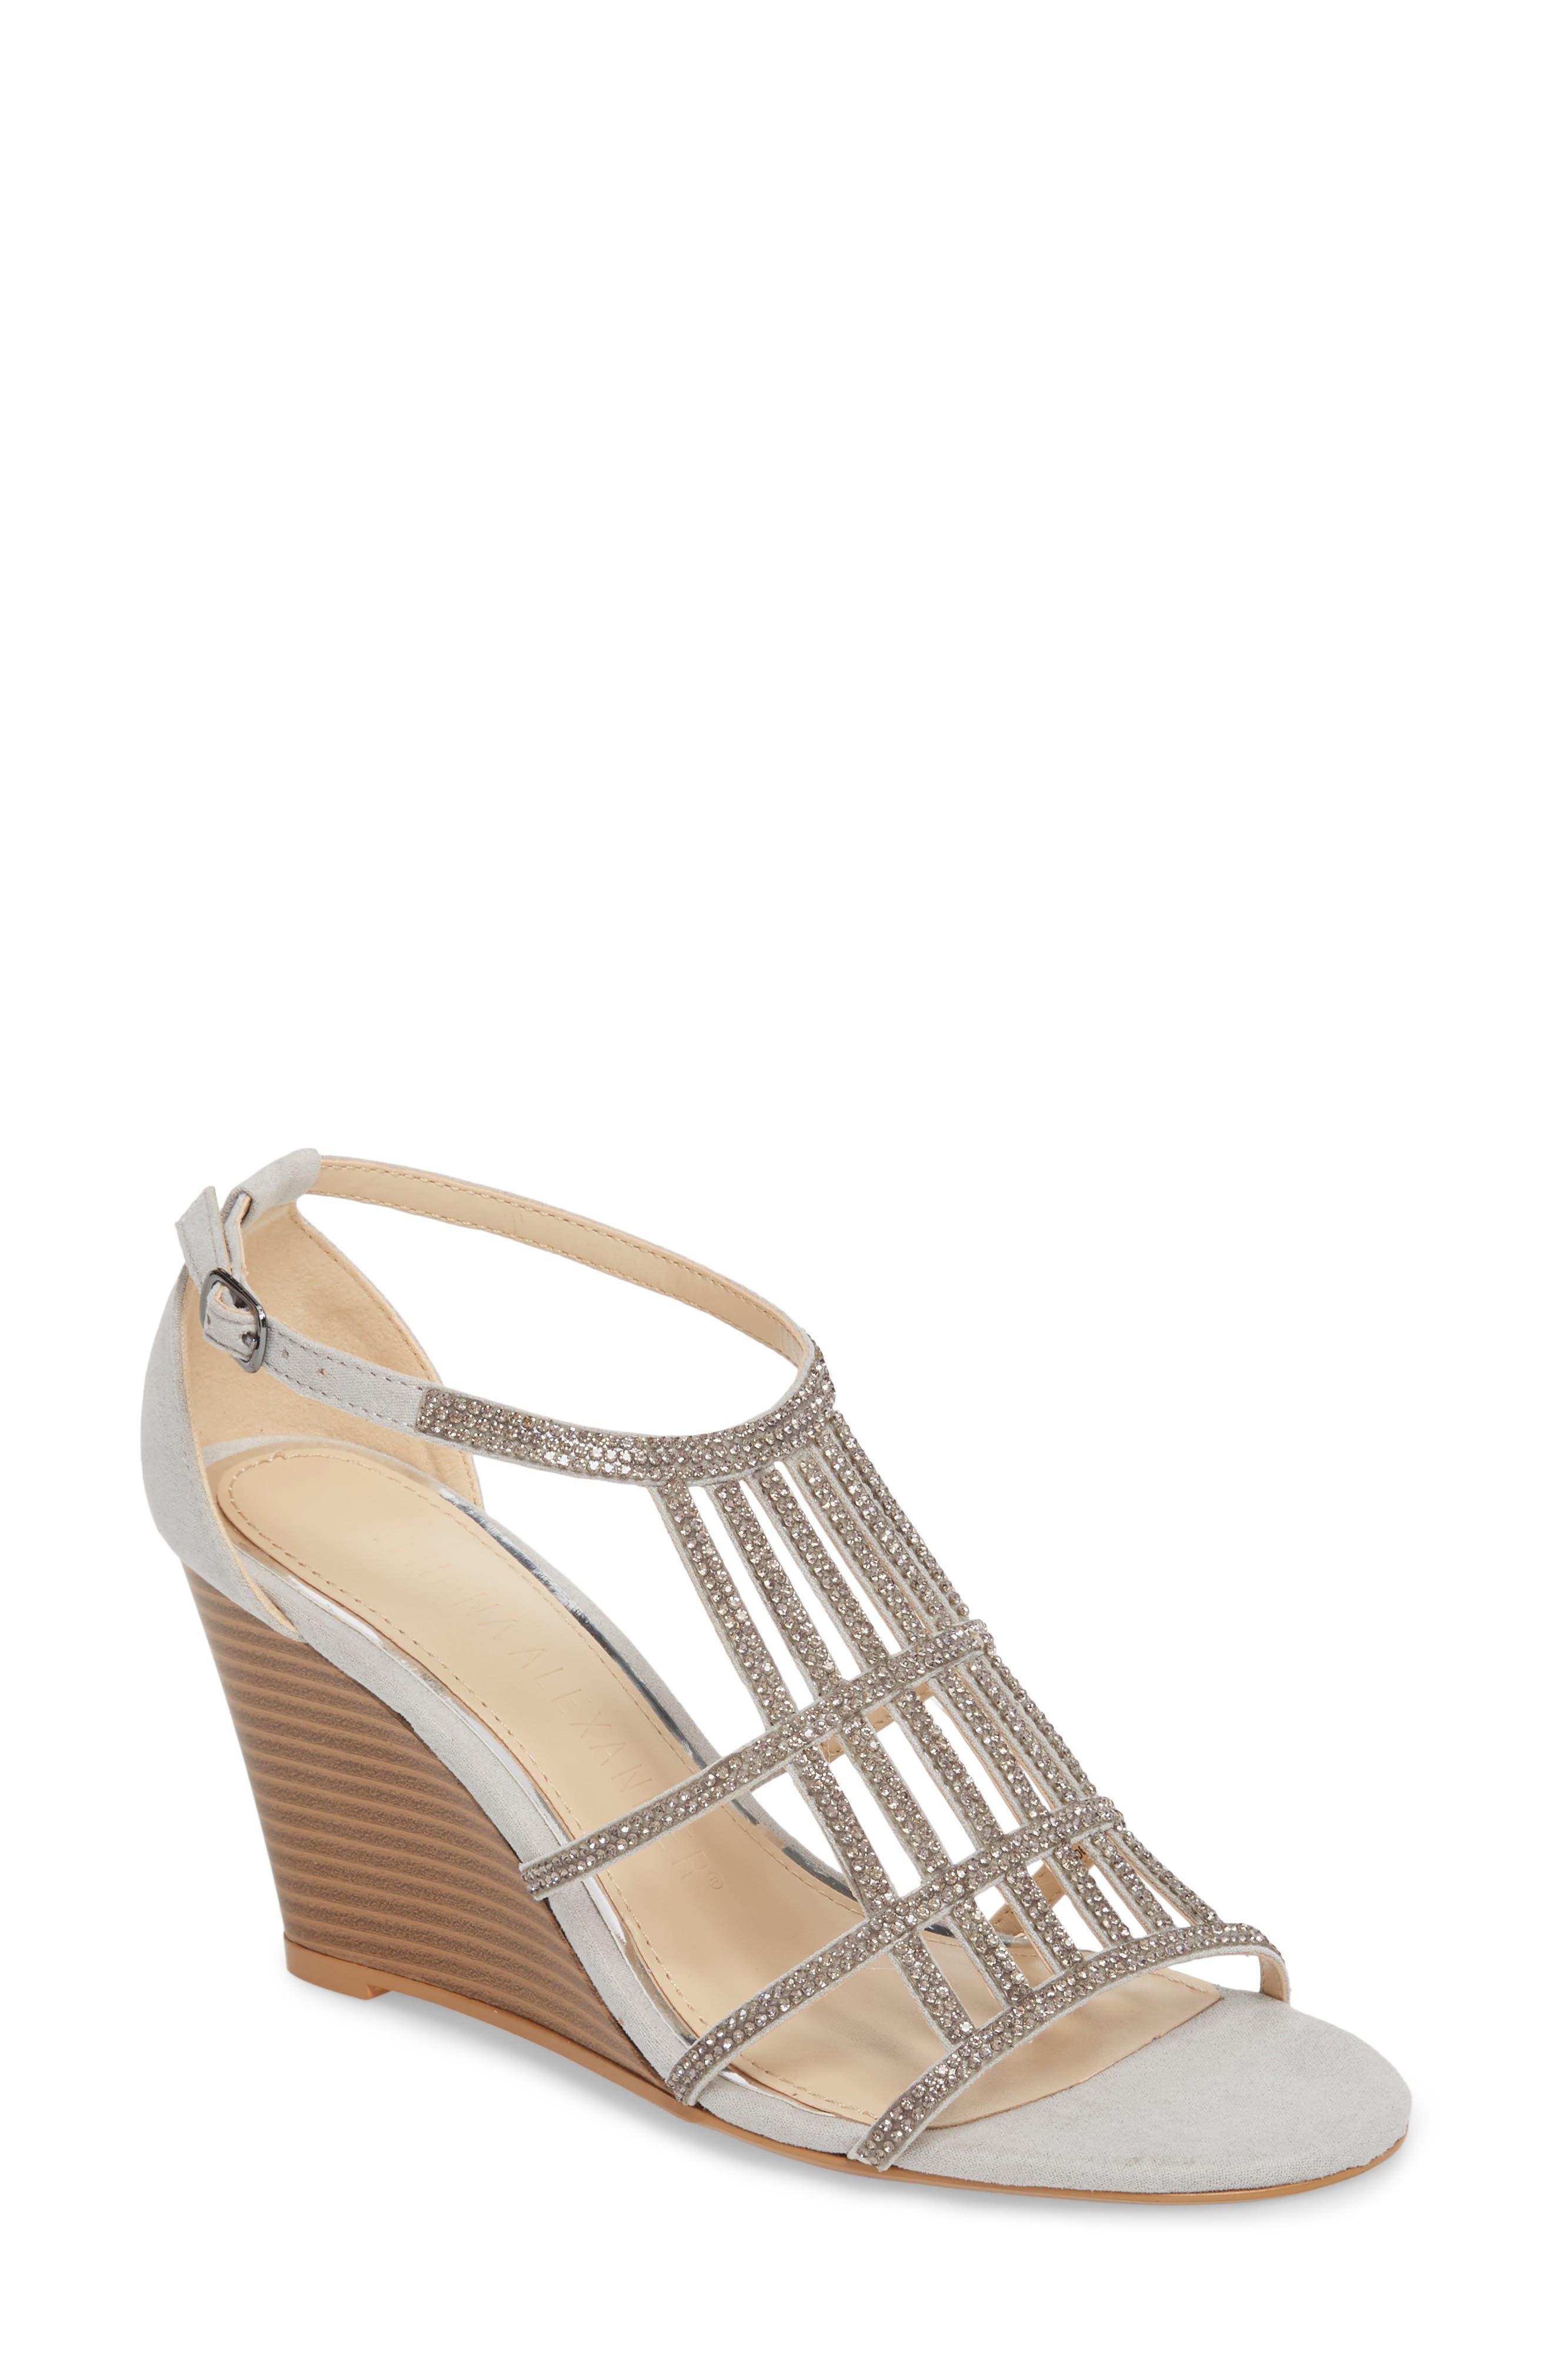 ATHENA Women's Hampton Crystal Embellished Wedge Sandal